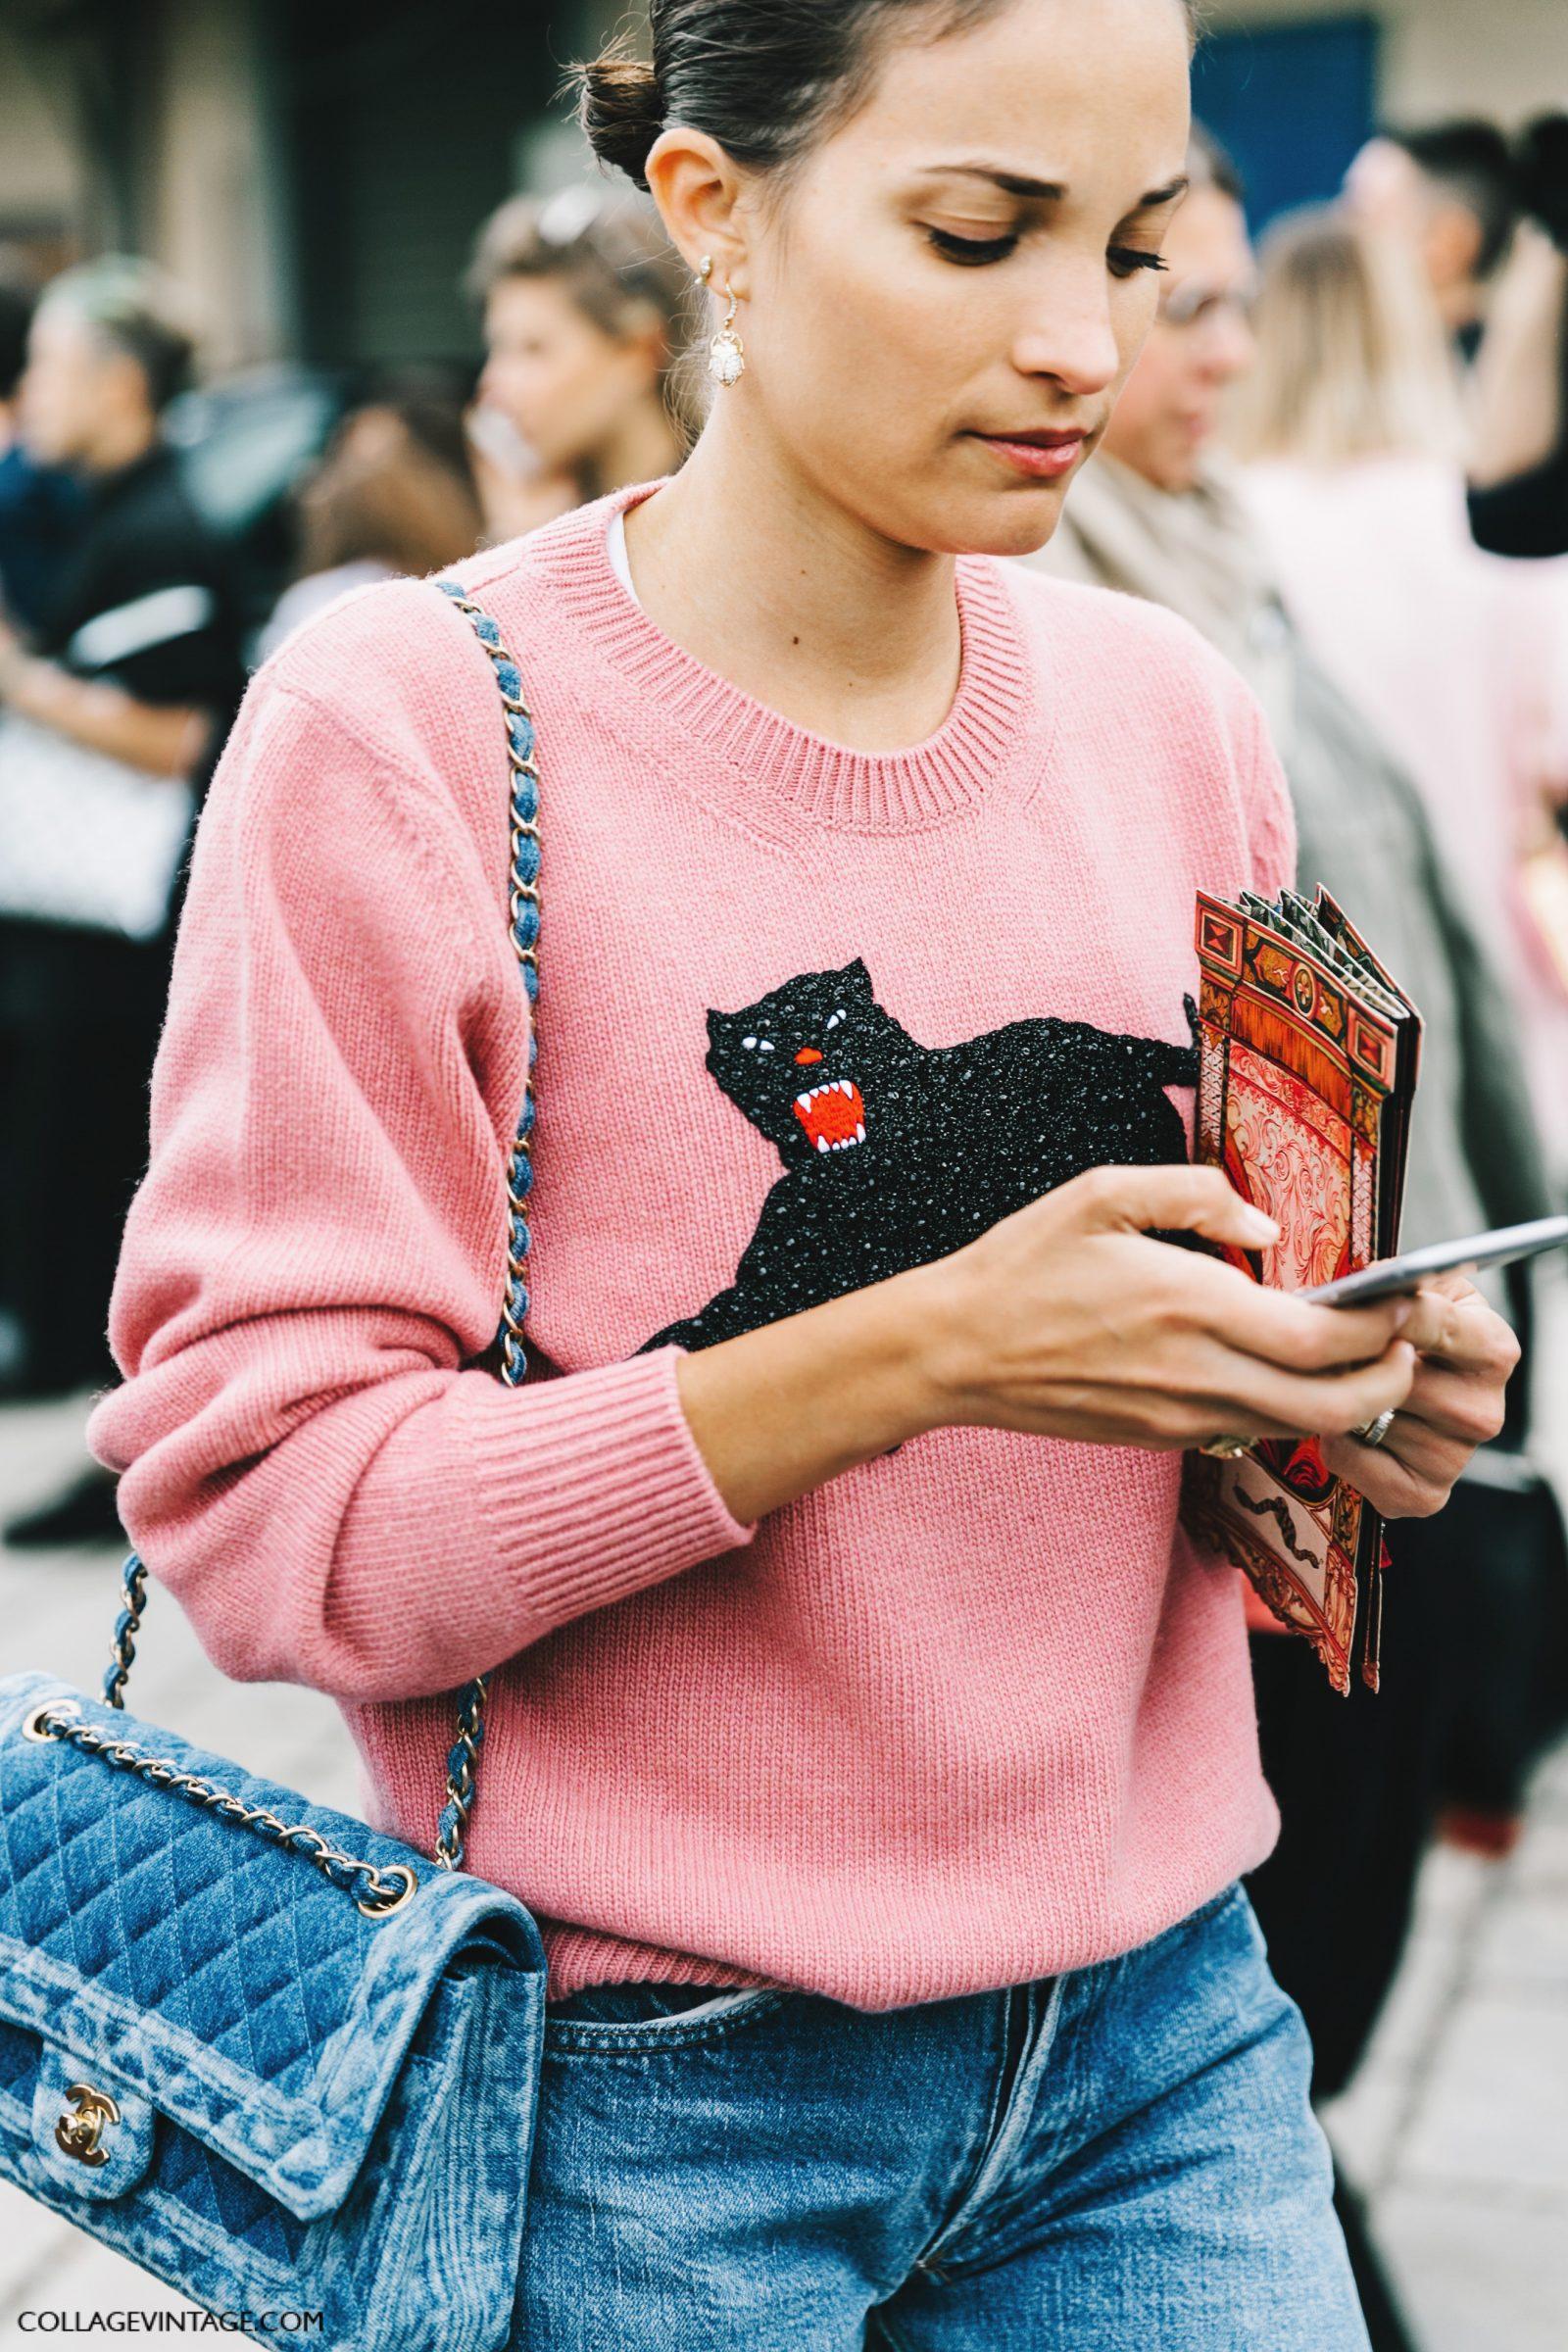 mfw-milan_fashion_week_ss17-street_style-outfits-collage_vintage-gucci-numero_21-alberta_ferreti-20